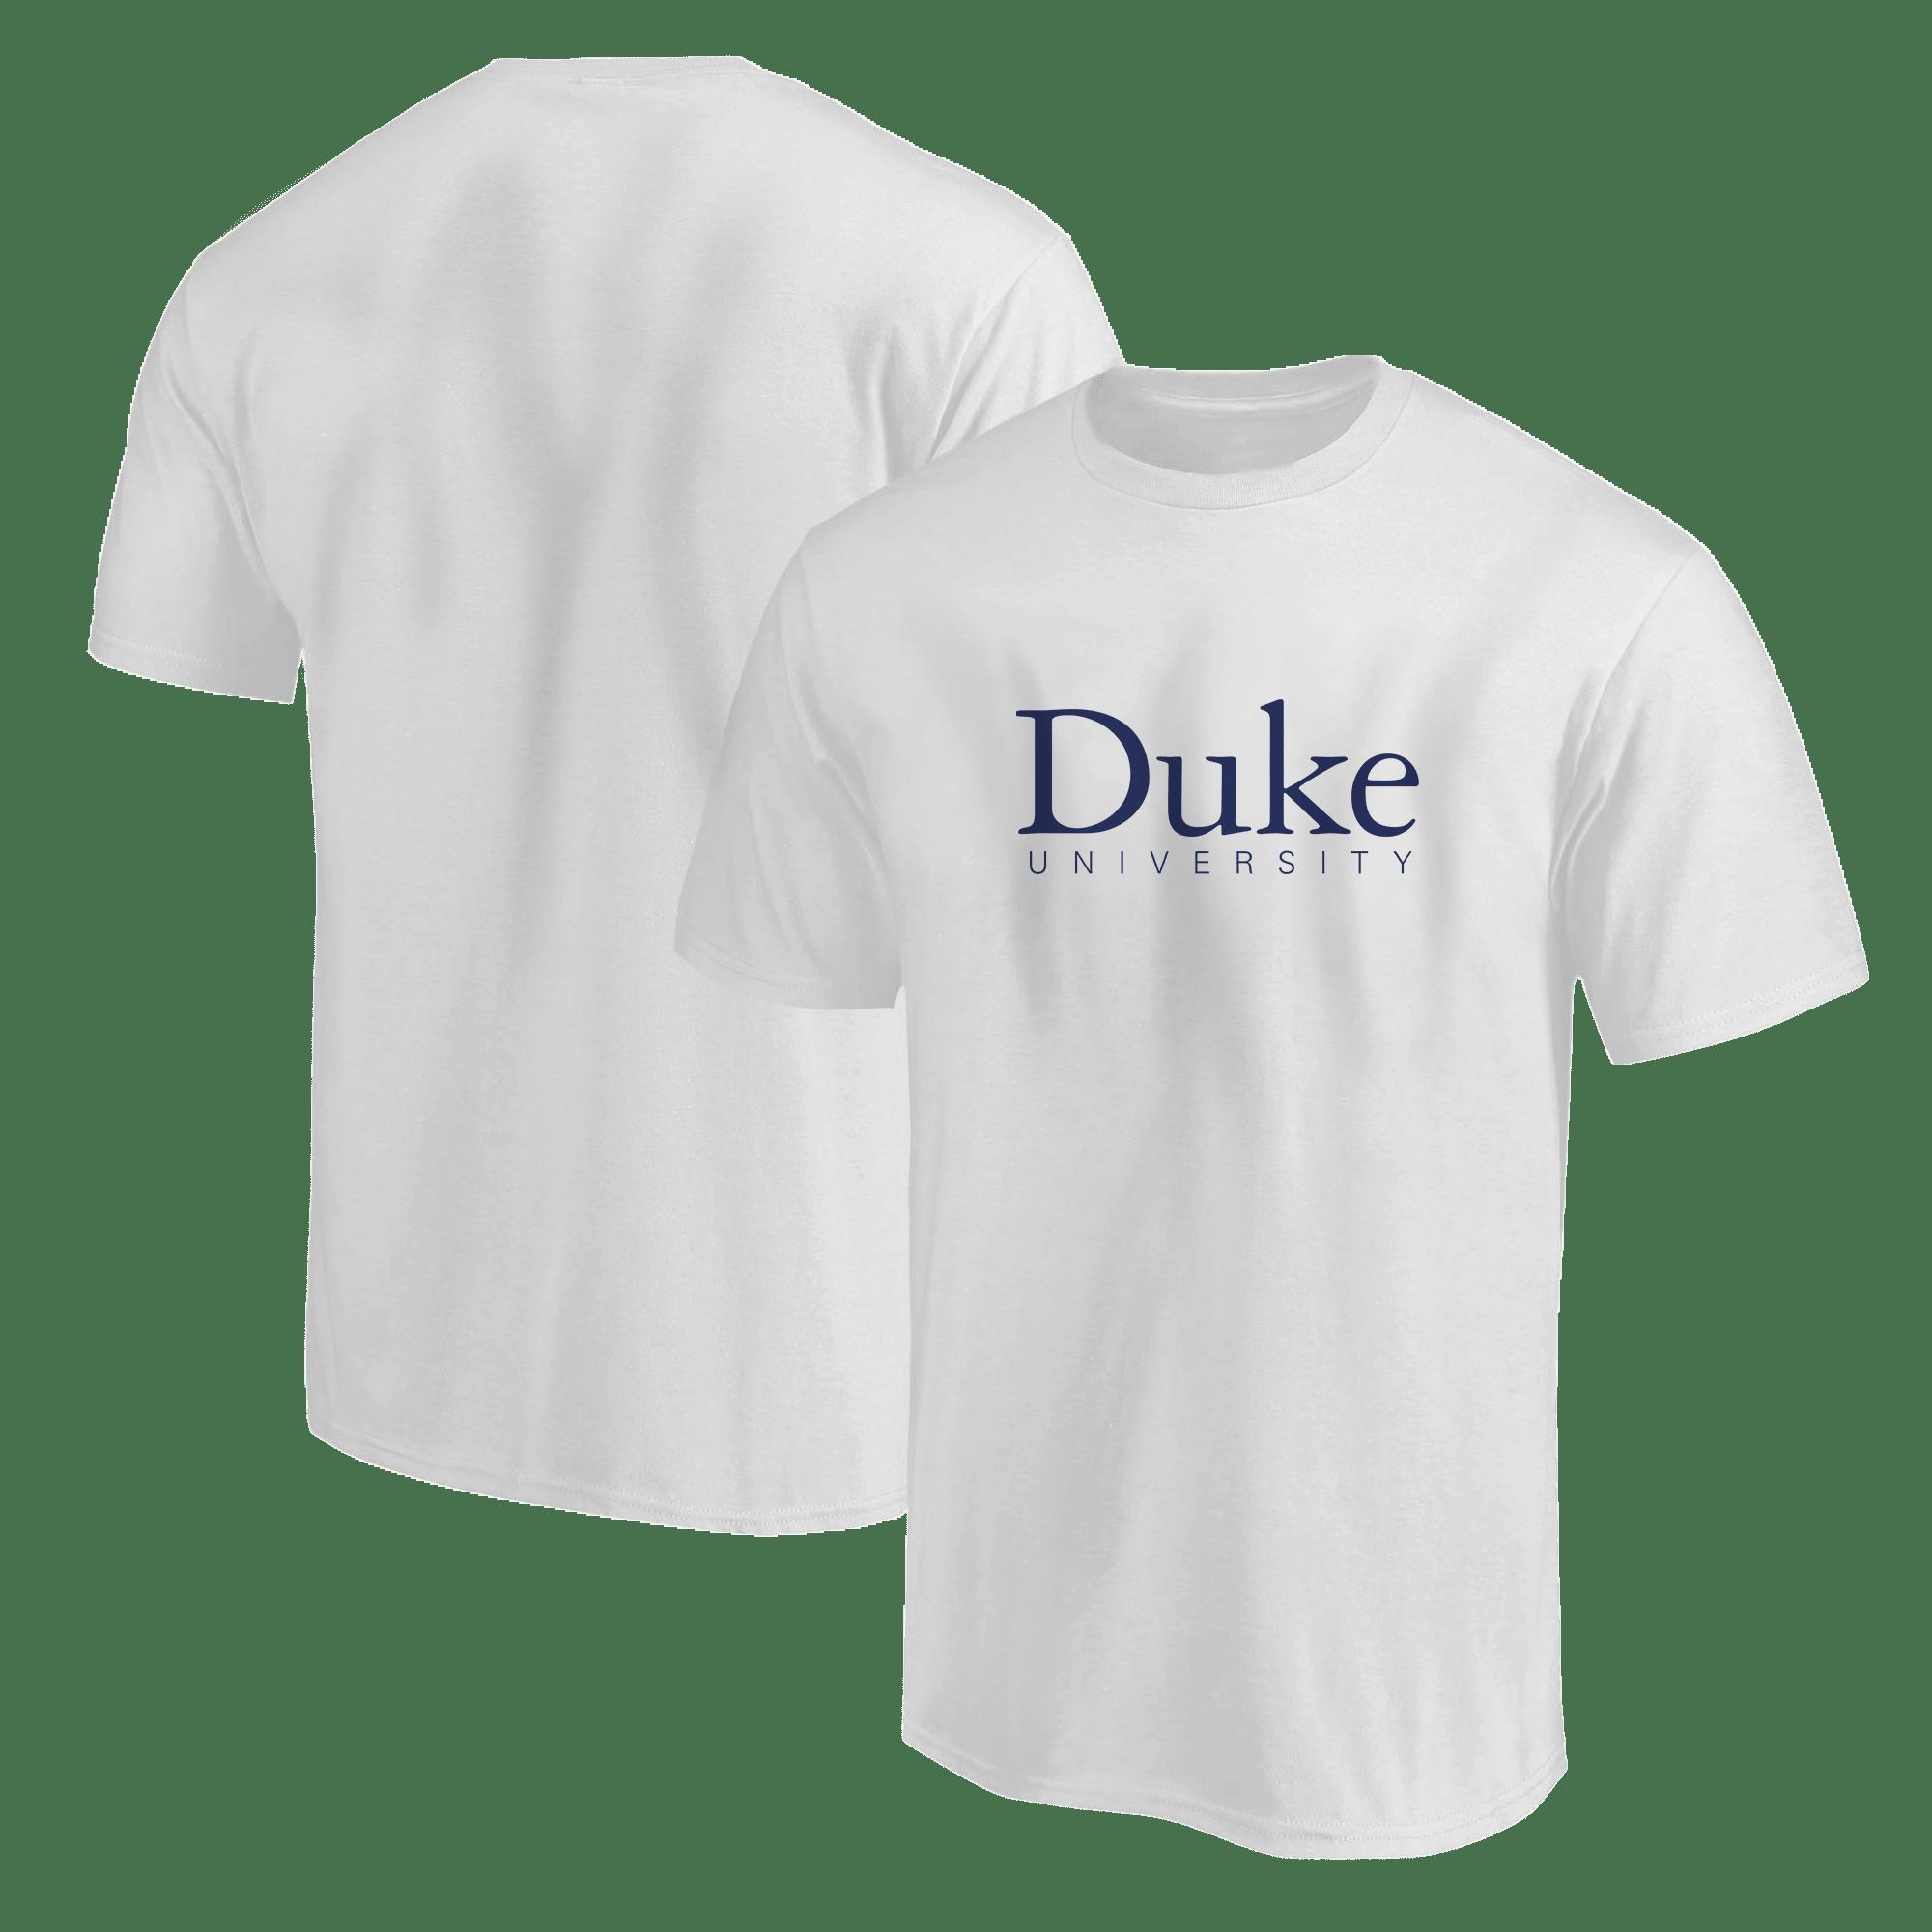 Duke University Tshirt (TSH-white-ncaa-NP-Duke-512)